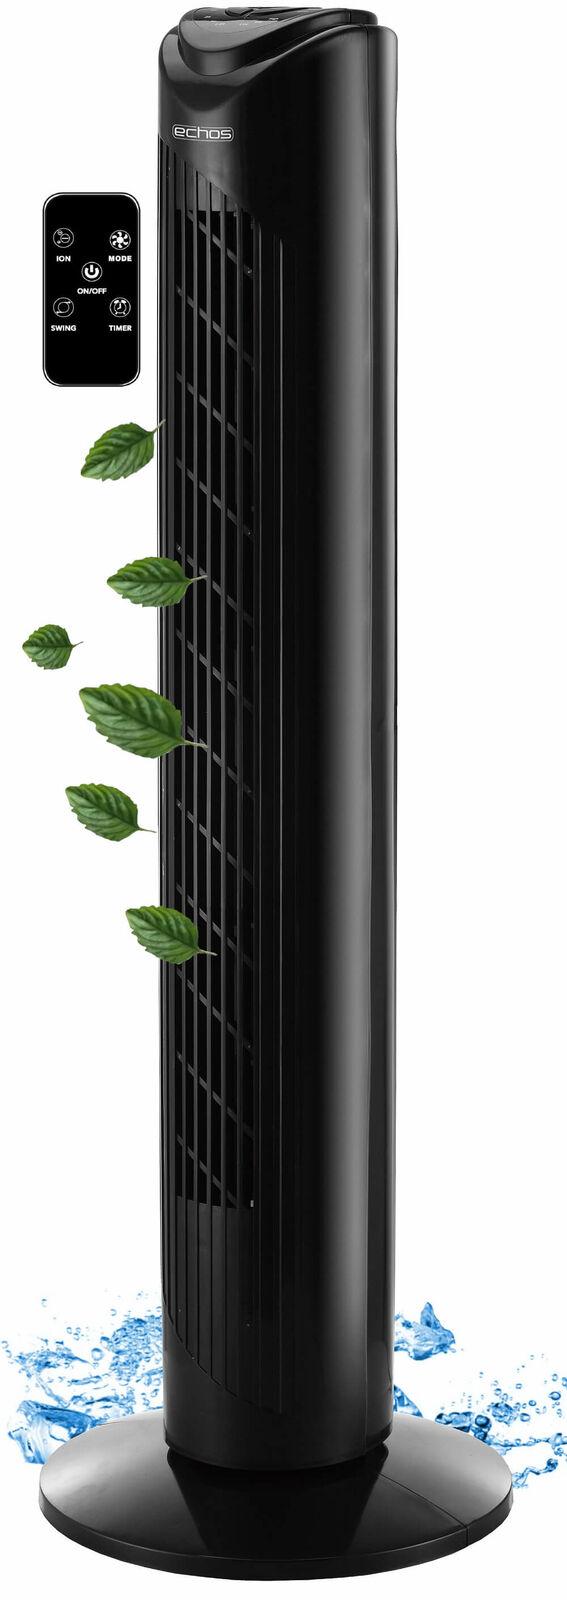 Turmventilator Tower-Ventilator Standventilator Fan Säulenventilator Luftkühler